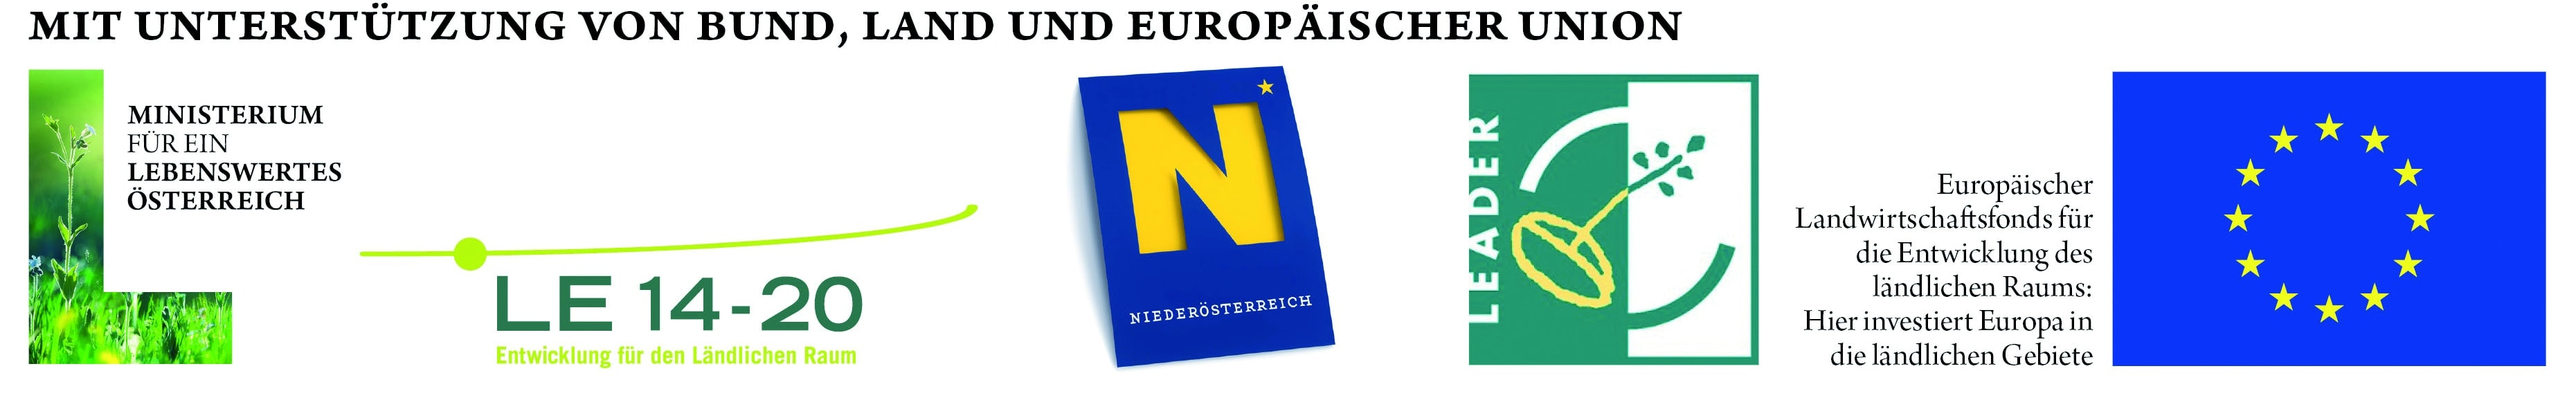 leader_bund_noe_eu